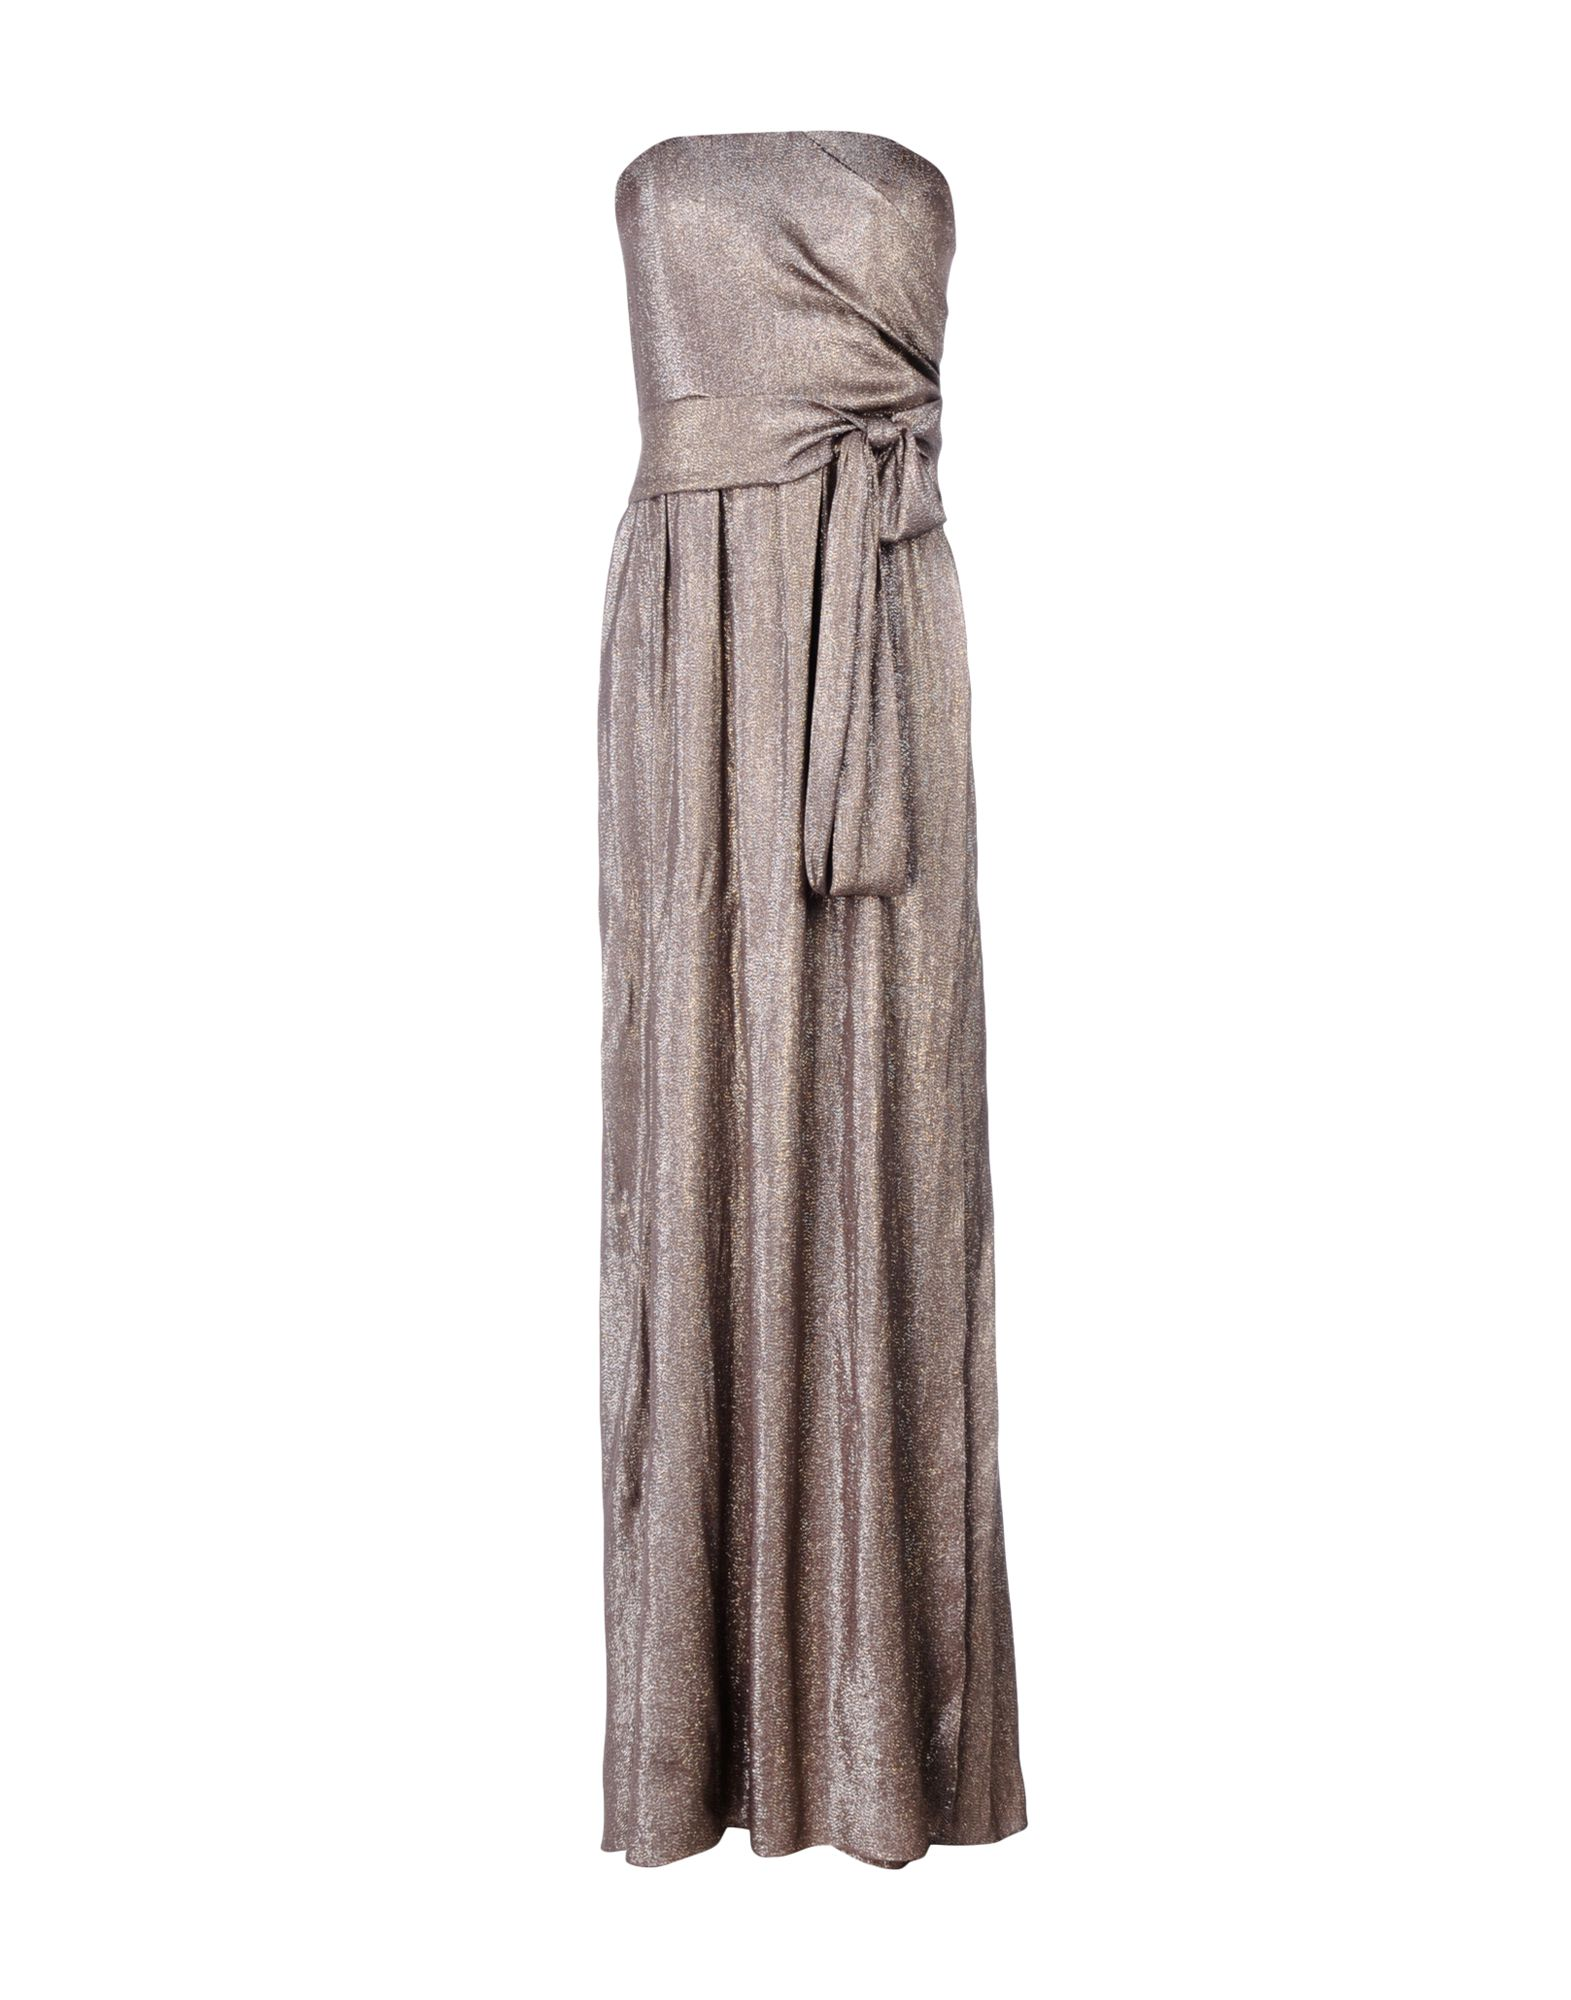 GUCCI Damen Langes Kleid Farbe Taubengrau Größe 4